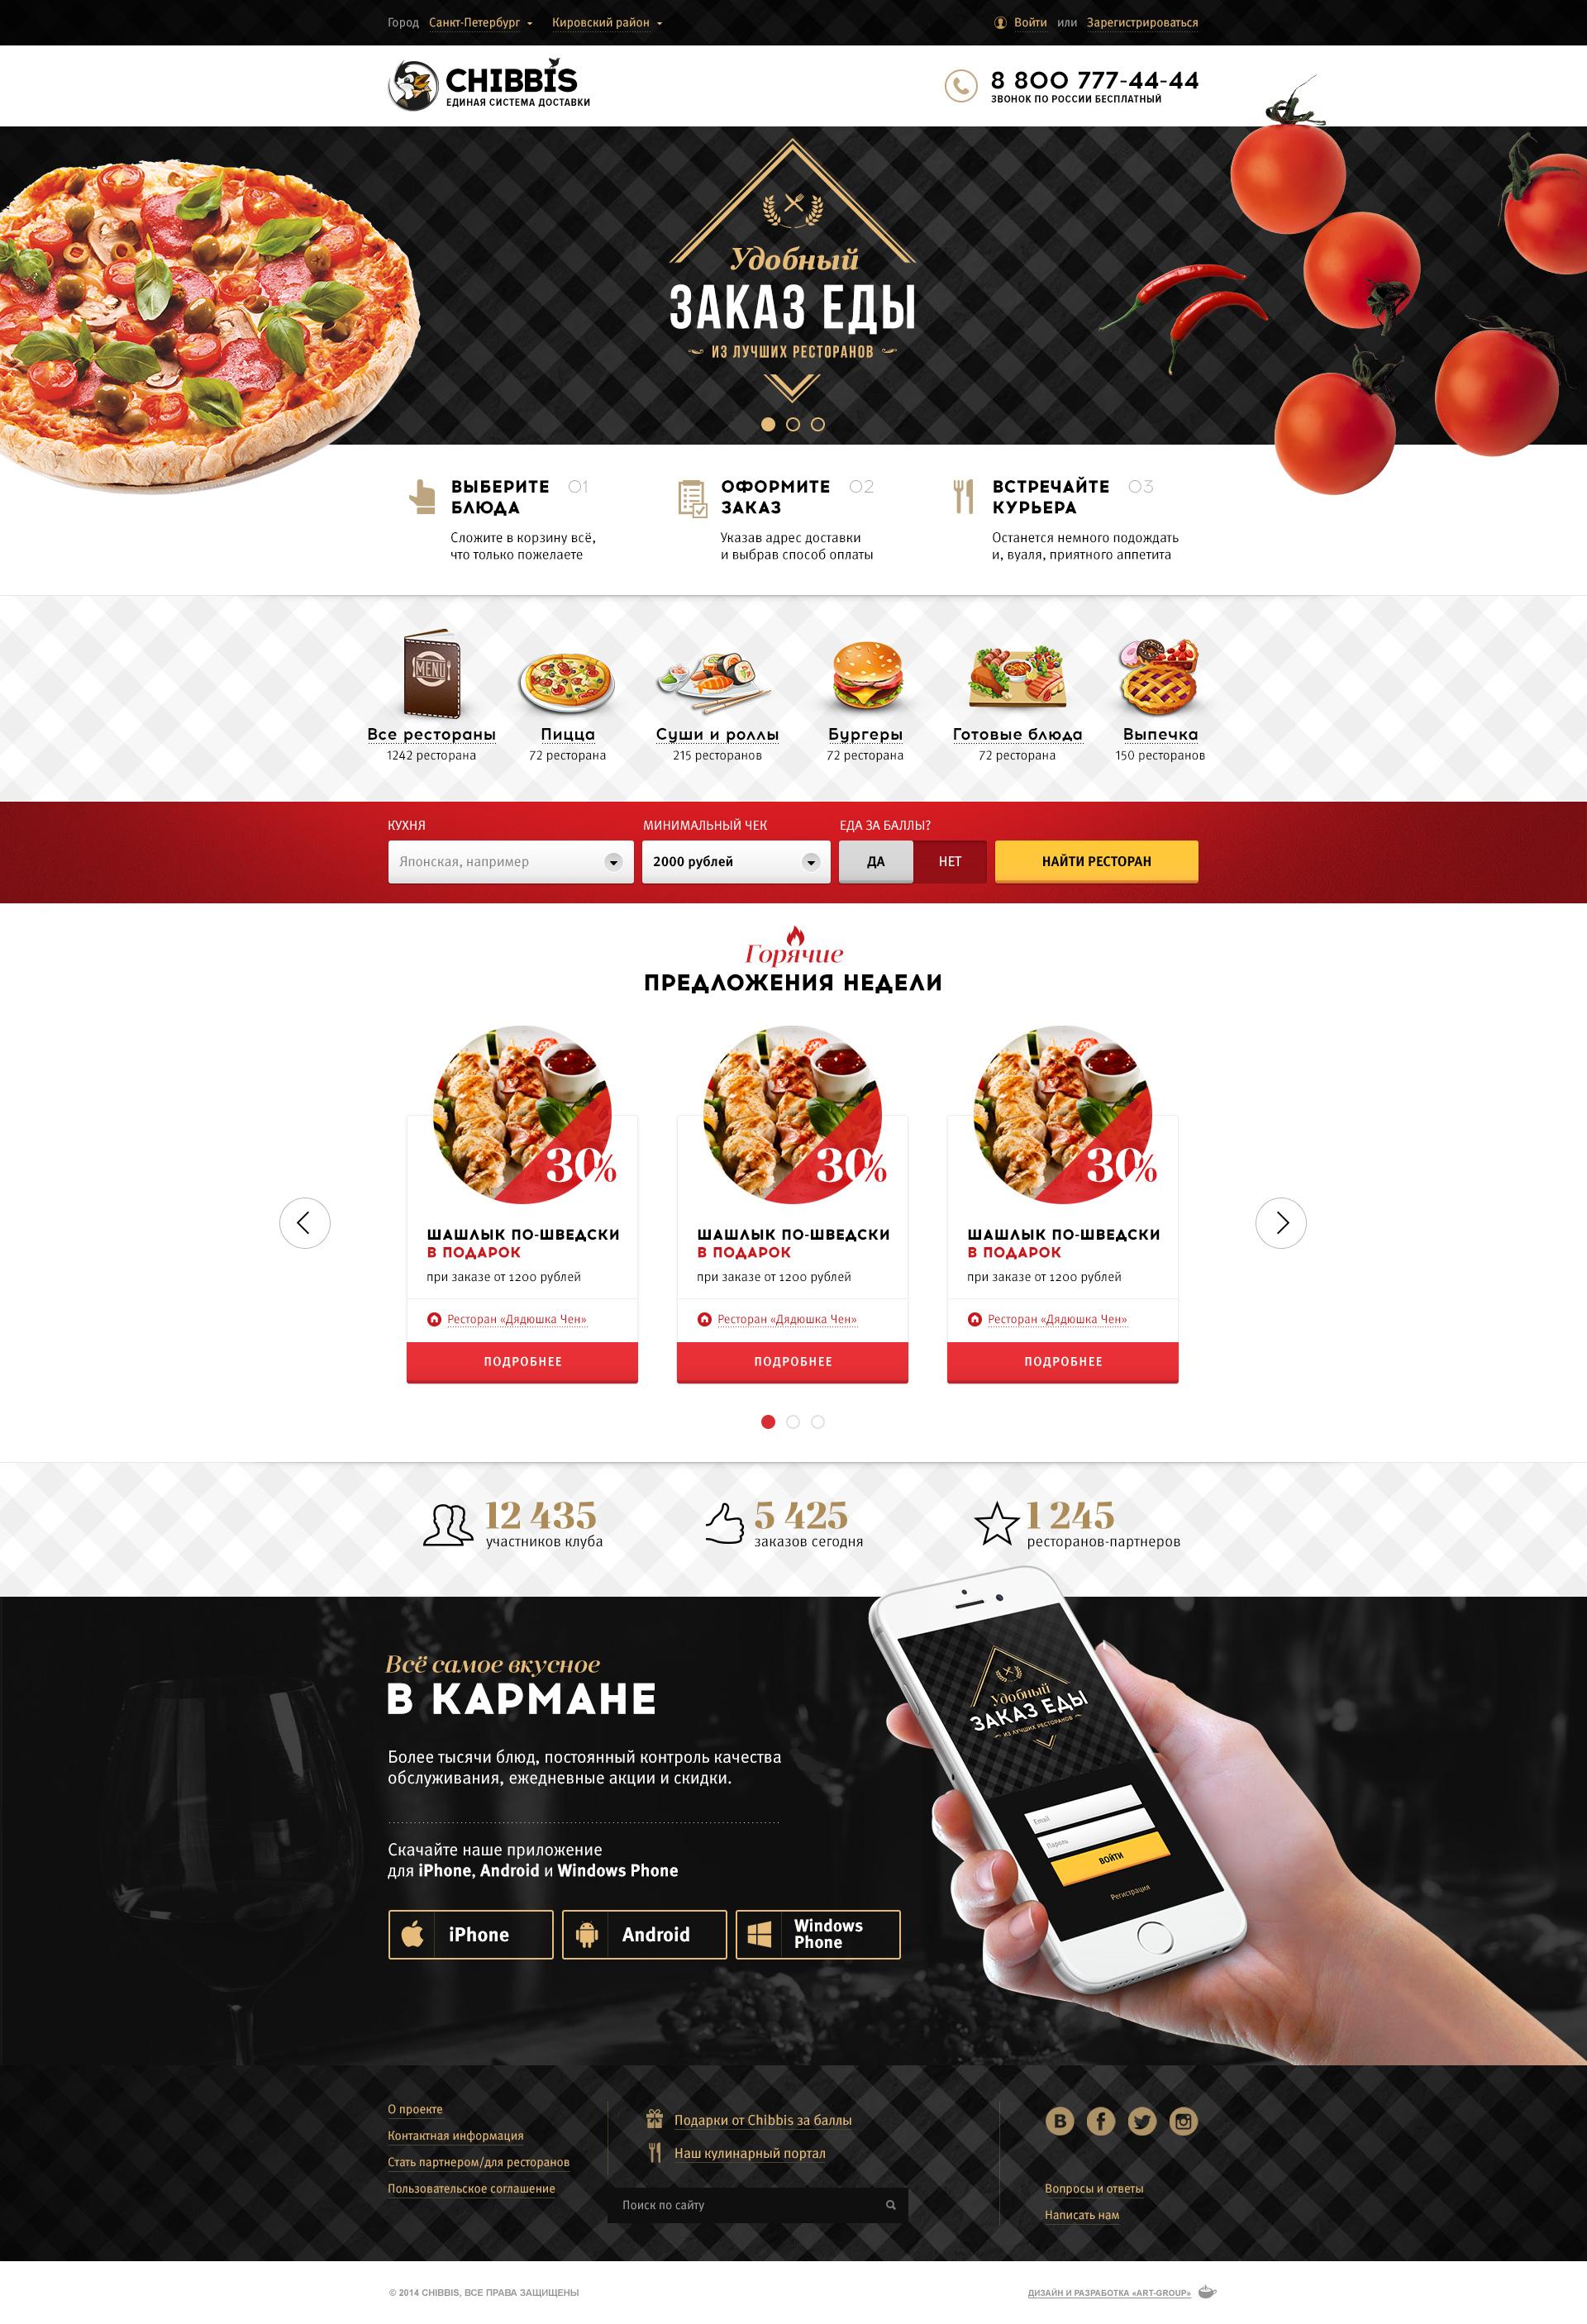 CHIBBIS, сайт пиццерии